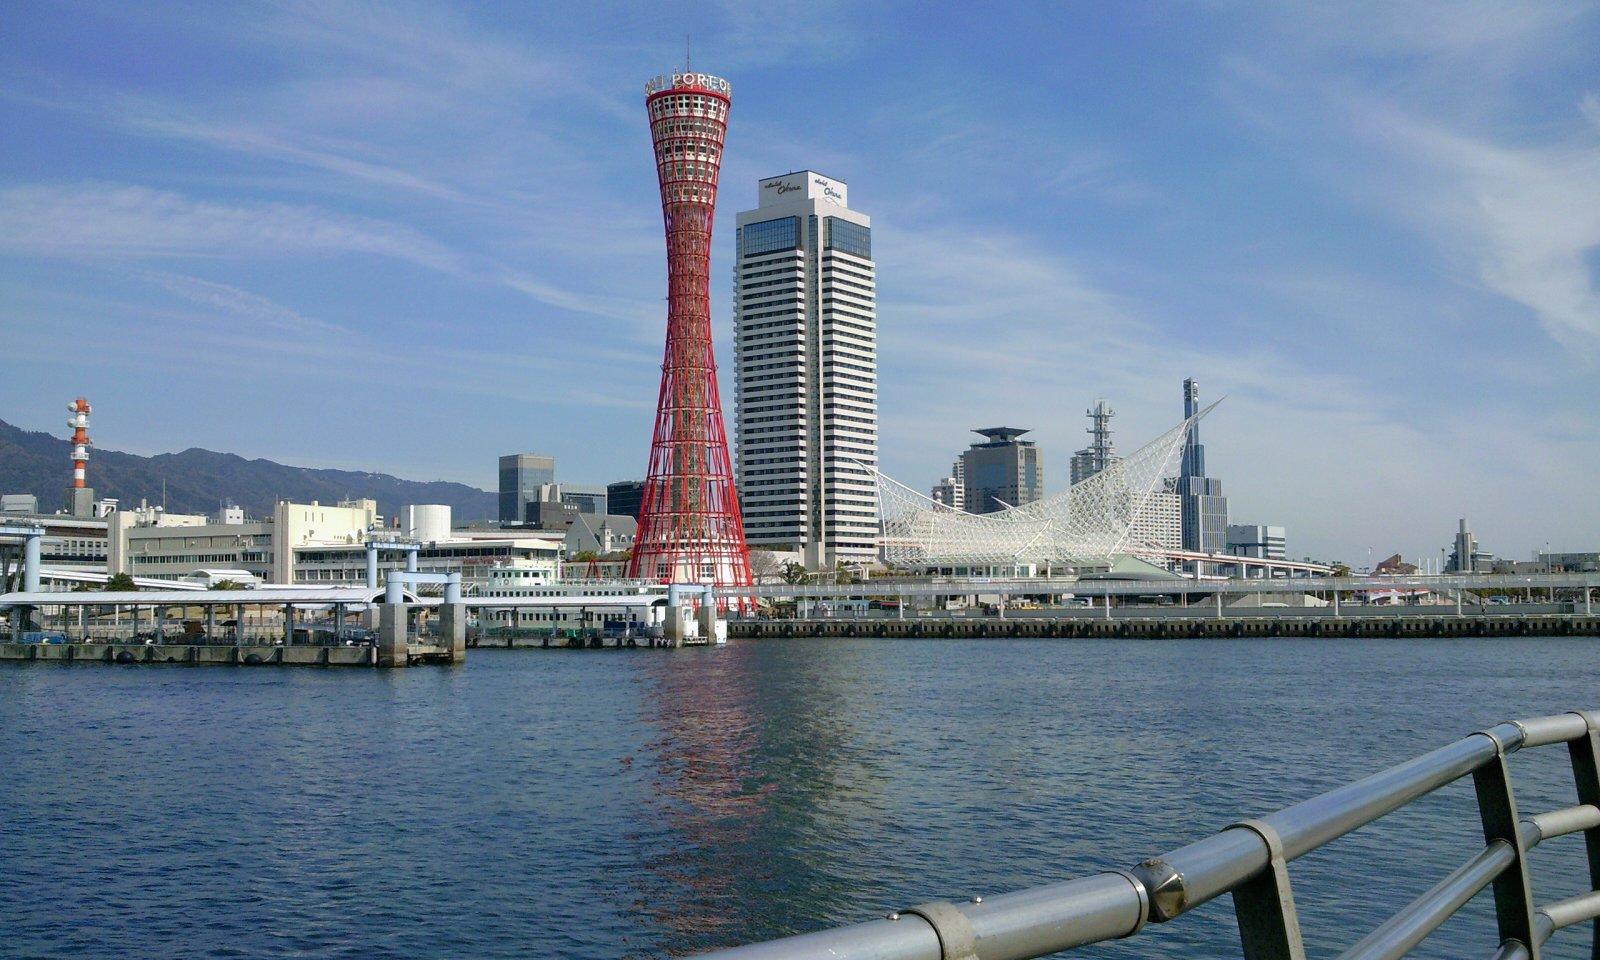 2011-02-19 11.47.16